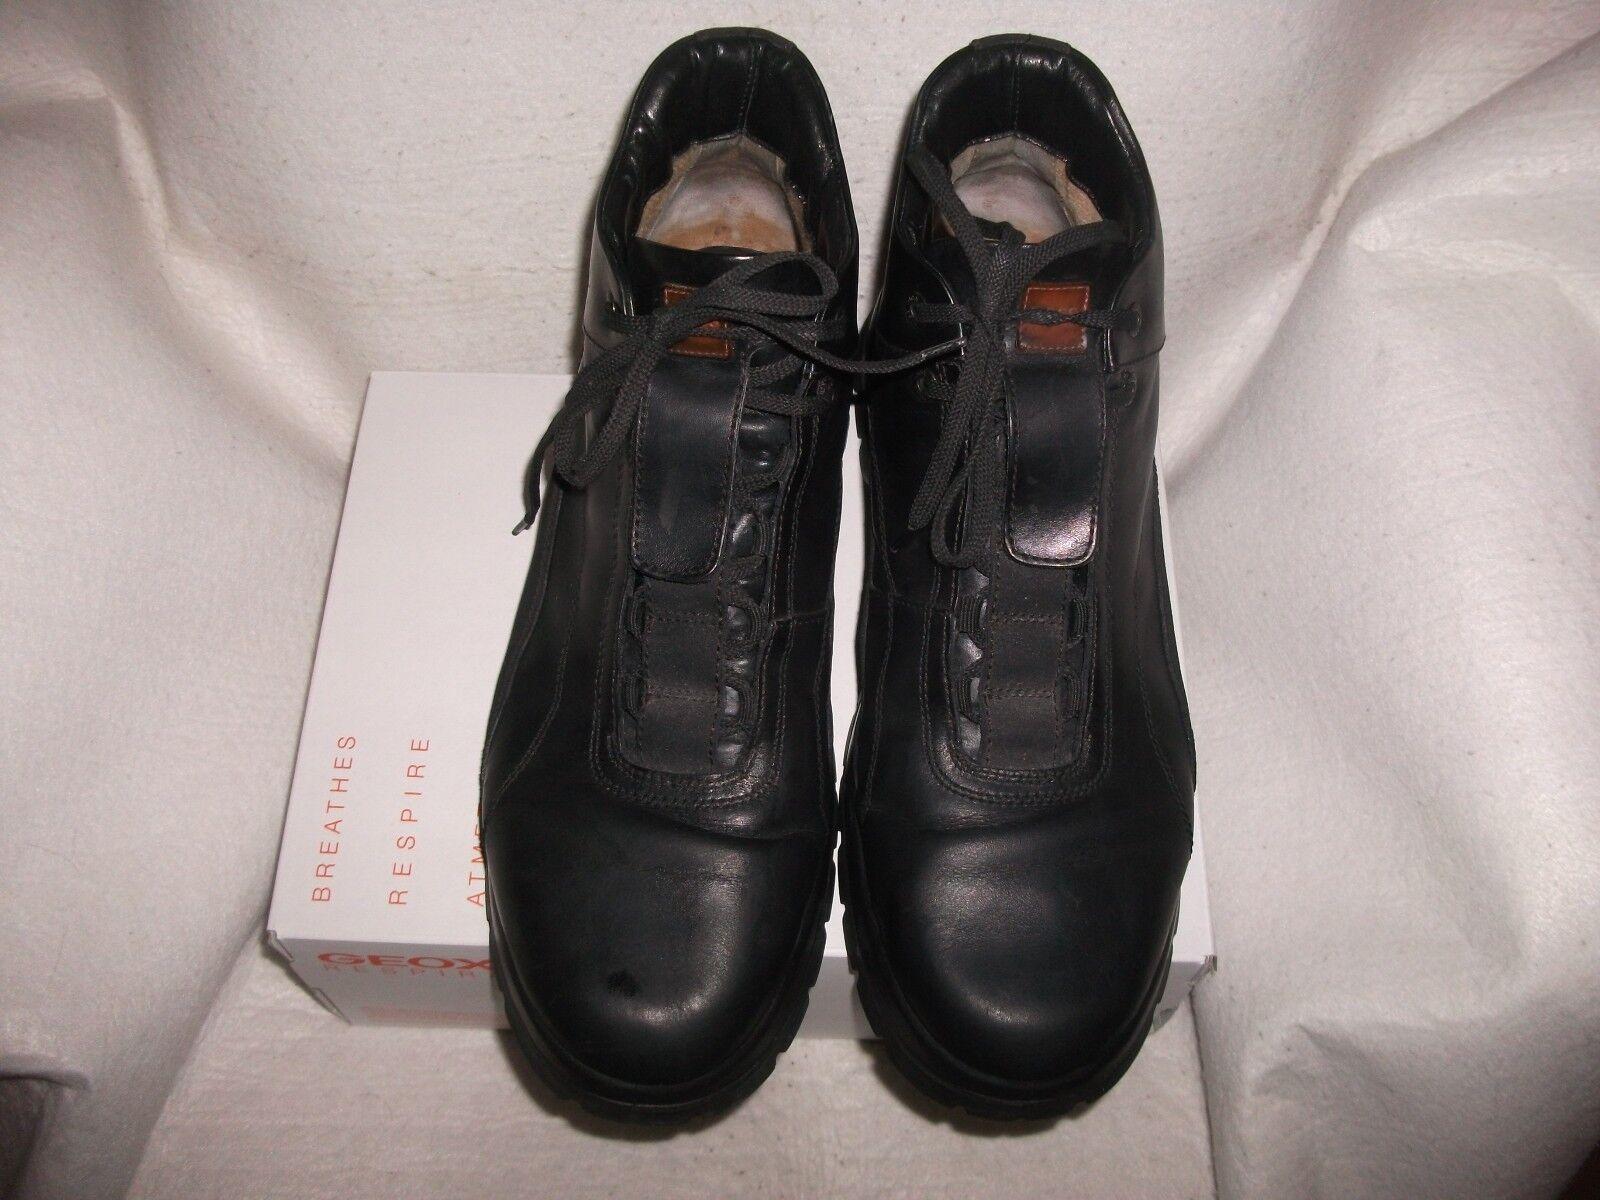 Herren boots HUGO BOSS Gr 46